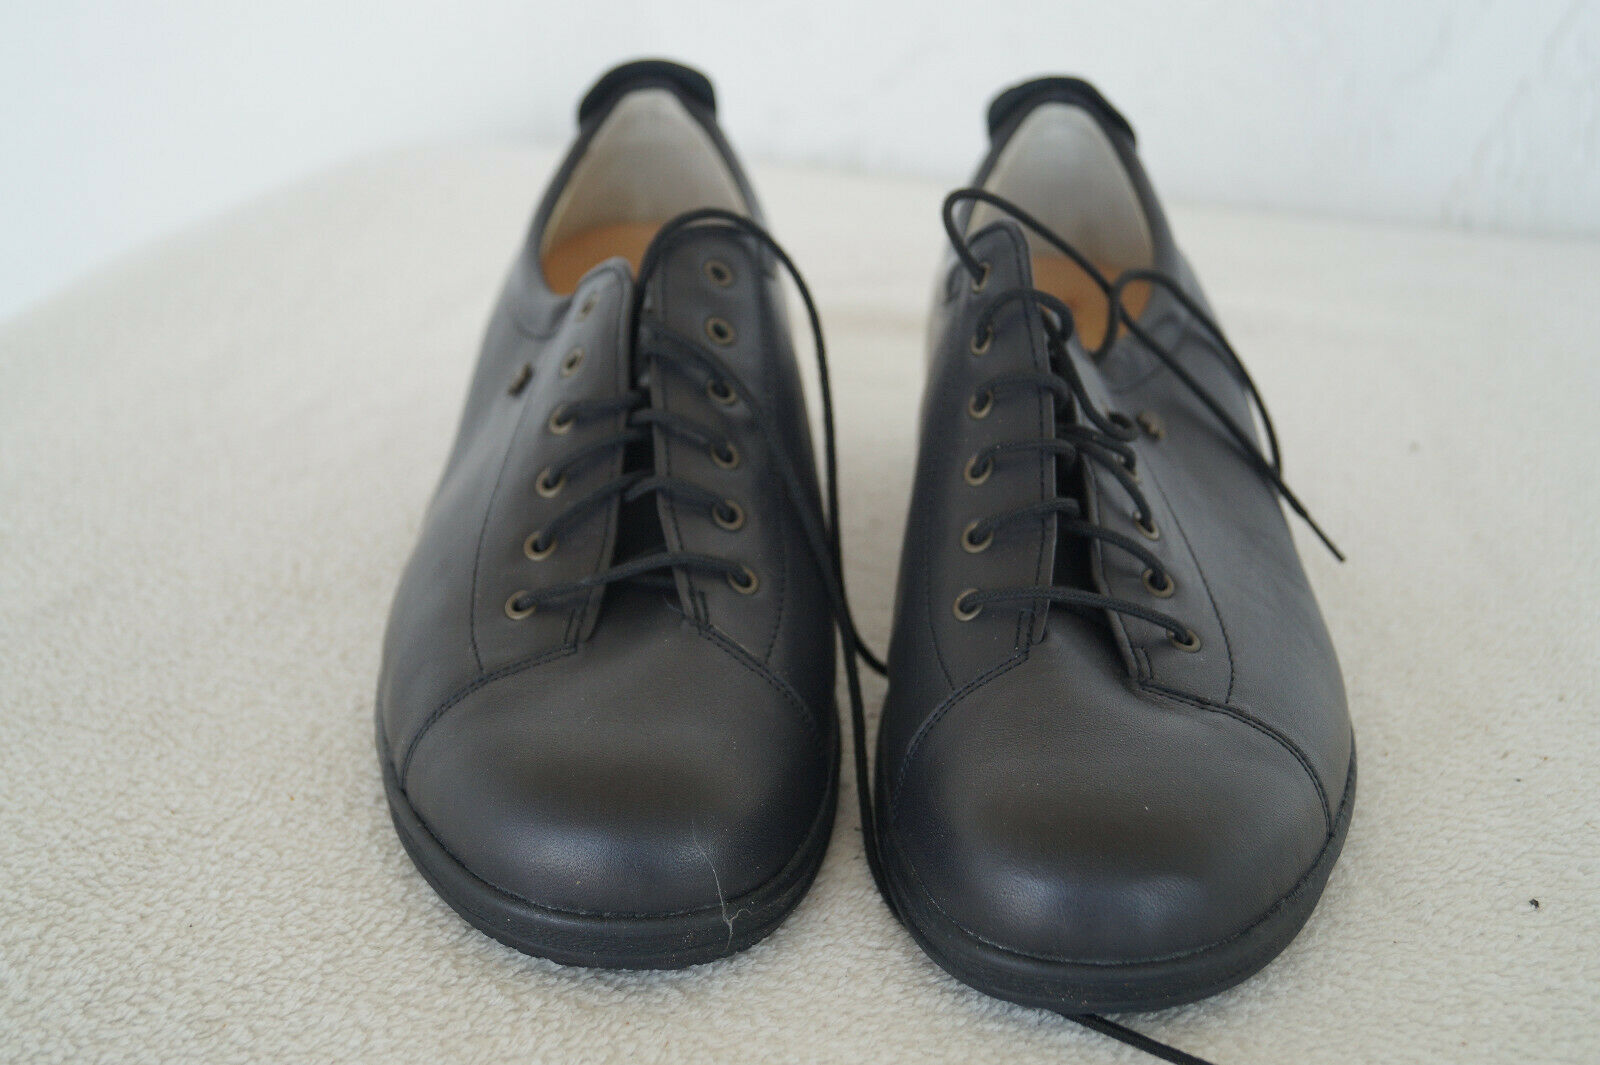 FINN COMFORT Ems Schuhe Schnürschuhe m. Einlagen Gr.8,5   42,5 schwarz Leder NEU